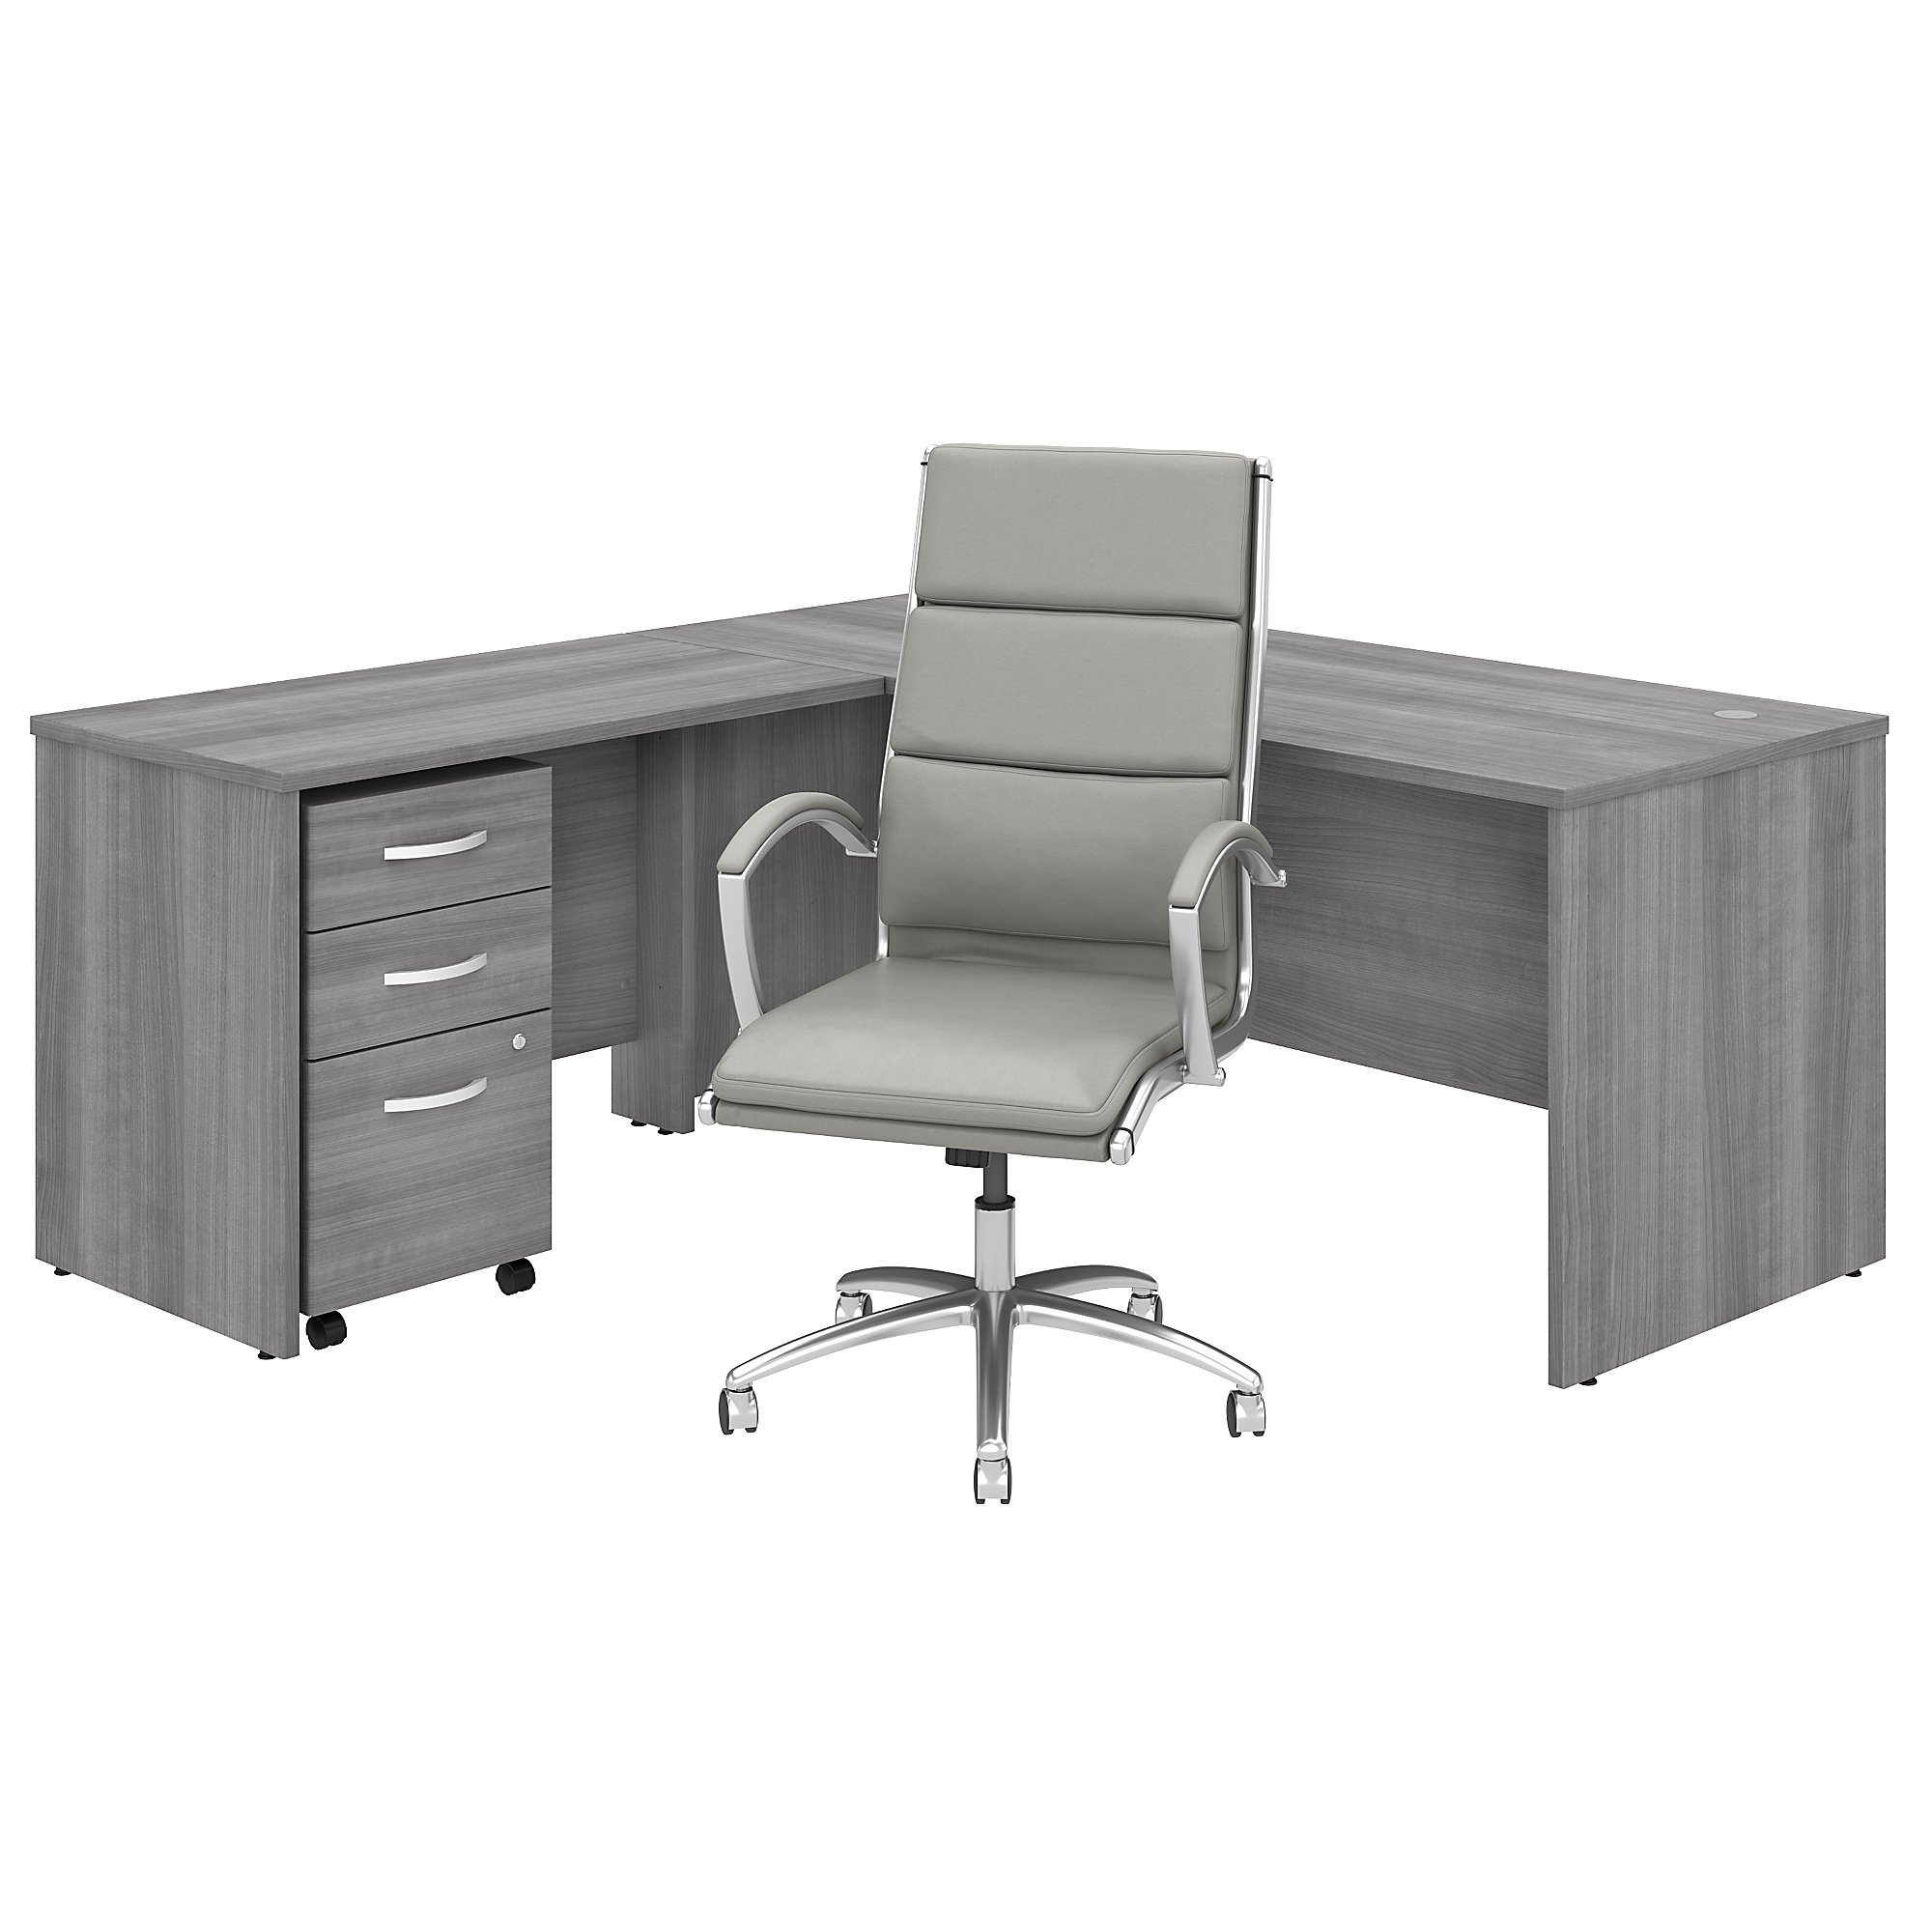 studio c l desk with chair in platinum gray